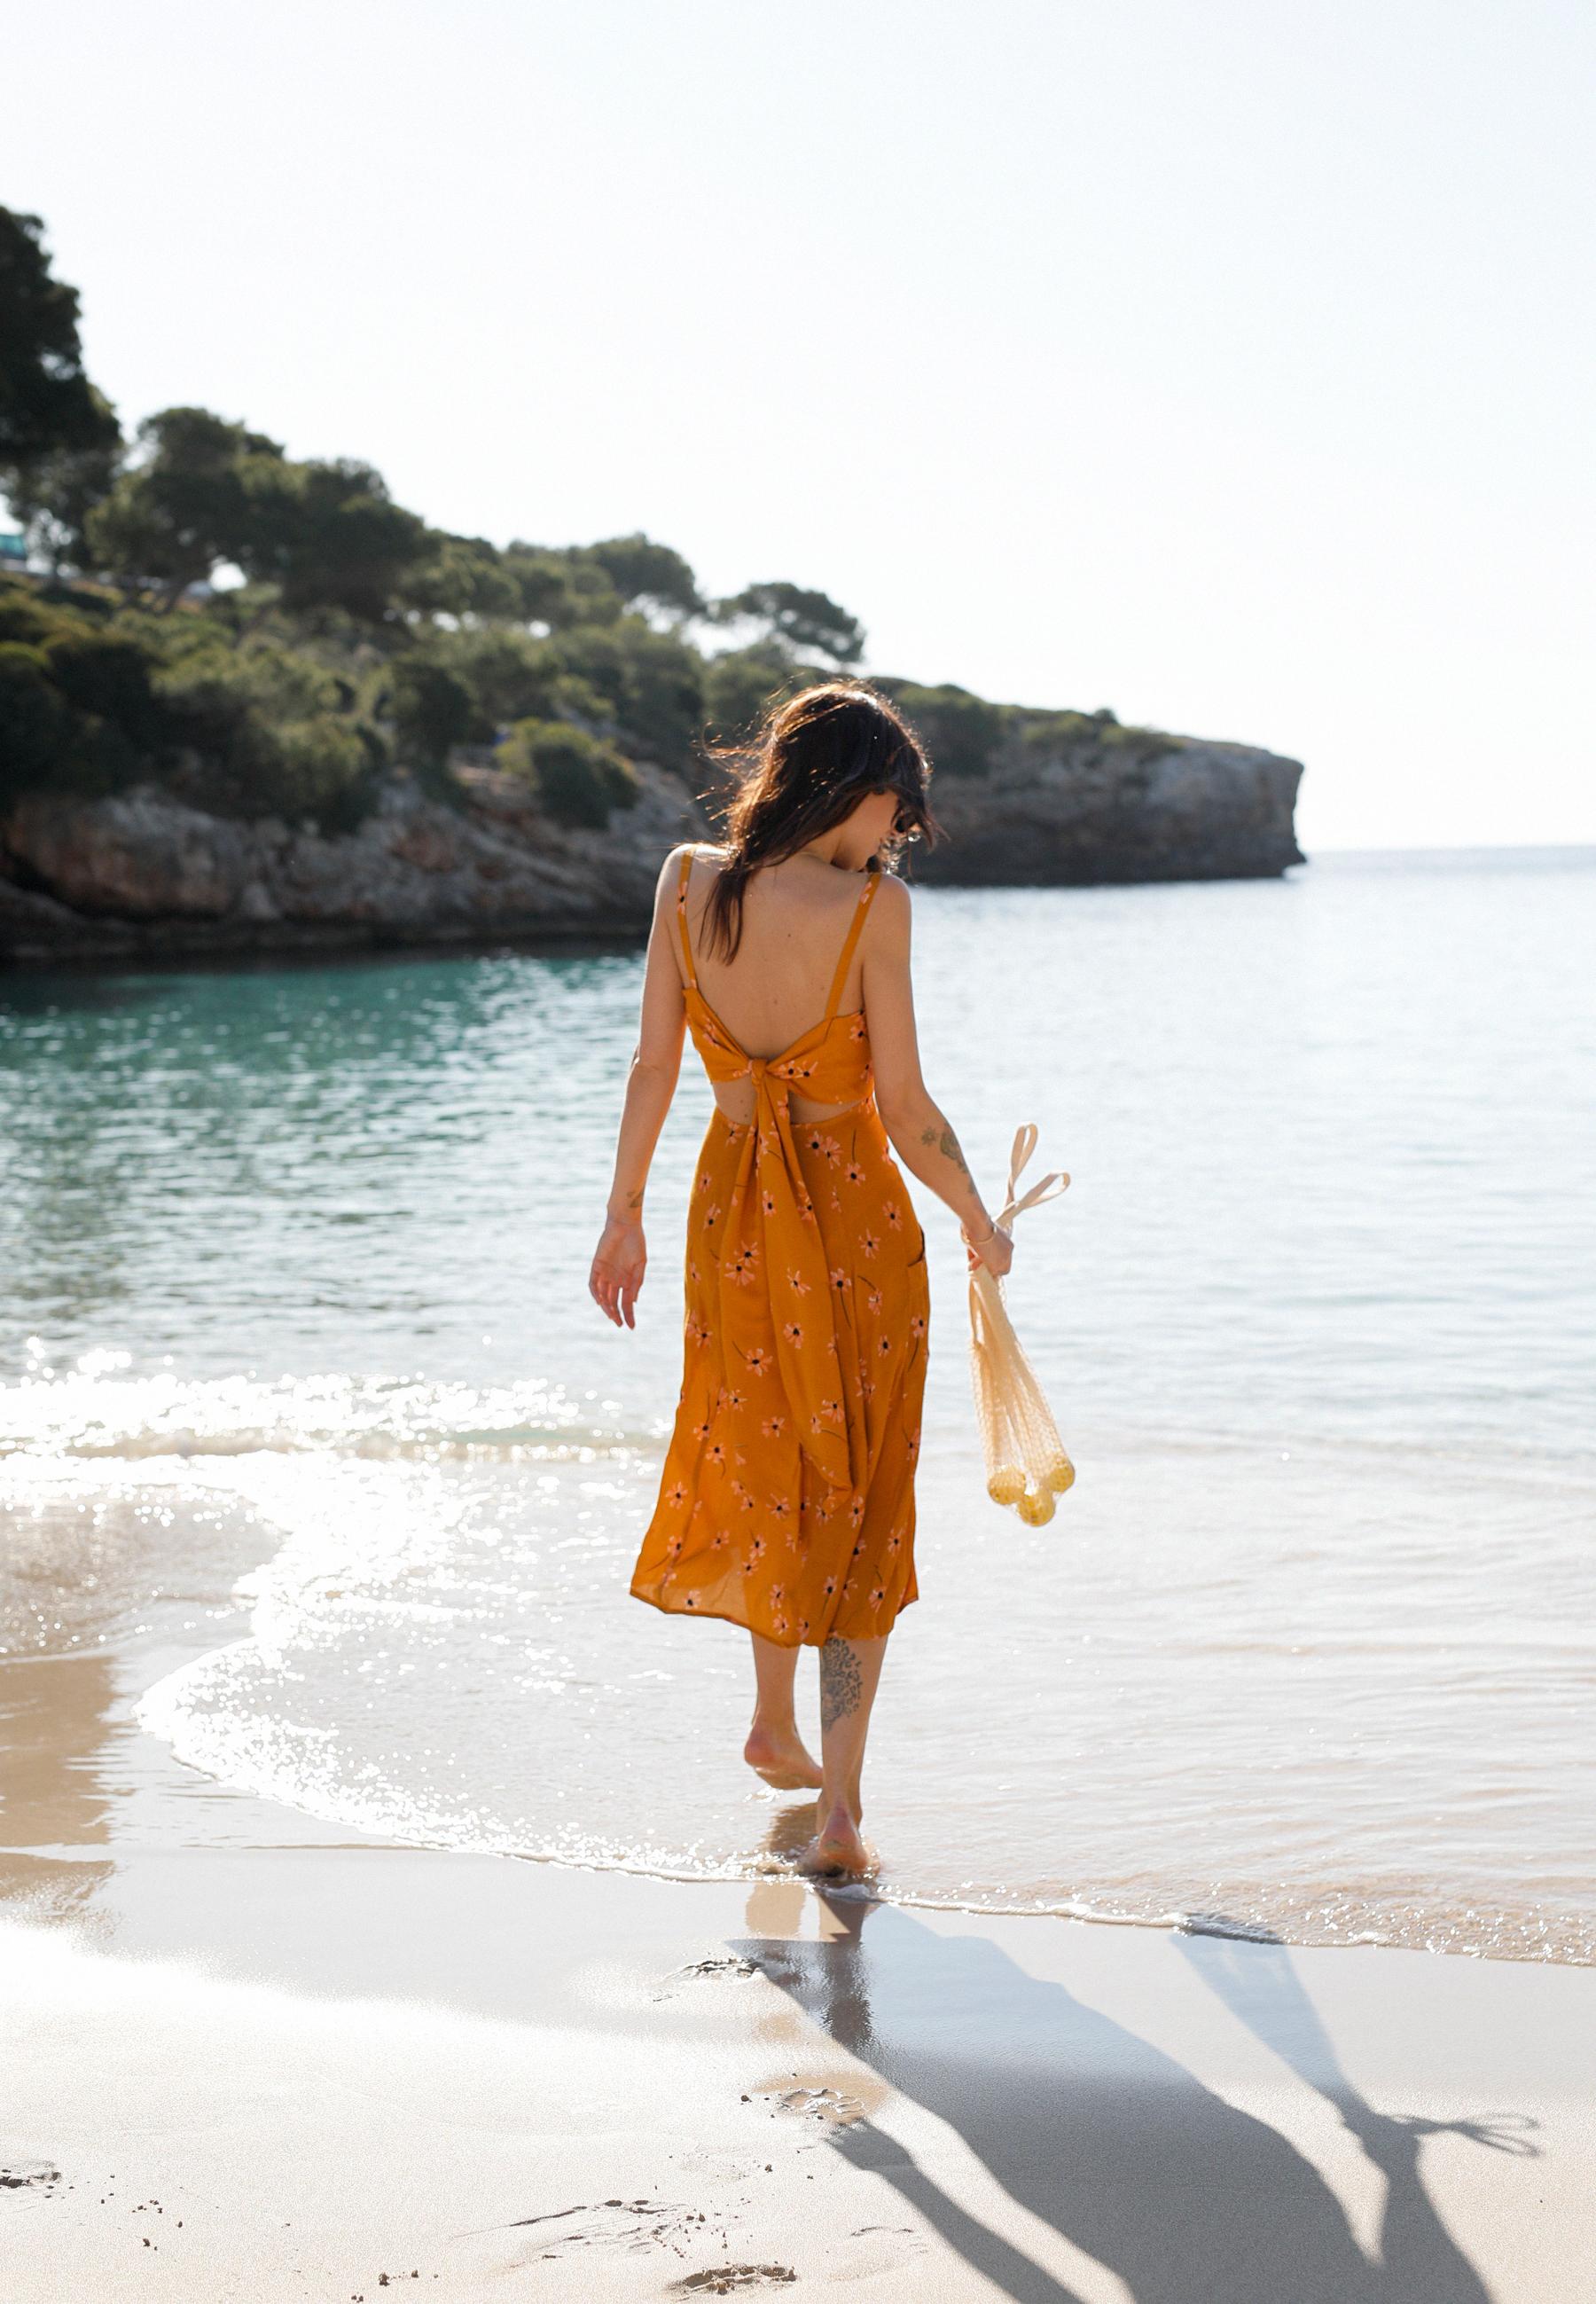 mallorca cala d'or esmeralda beach outfit ootd mood strand shooting mode fashionblogger blogger reiseblog fauthfull the brand asos kleid ocker ochre style bloggers stylist catsanddogsblog ricarda schernus düsseldorf 1